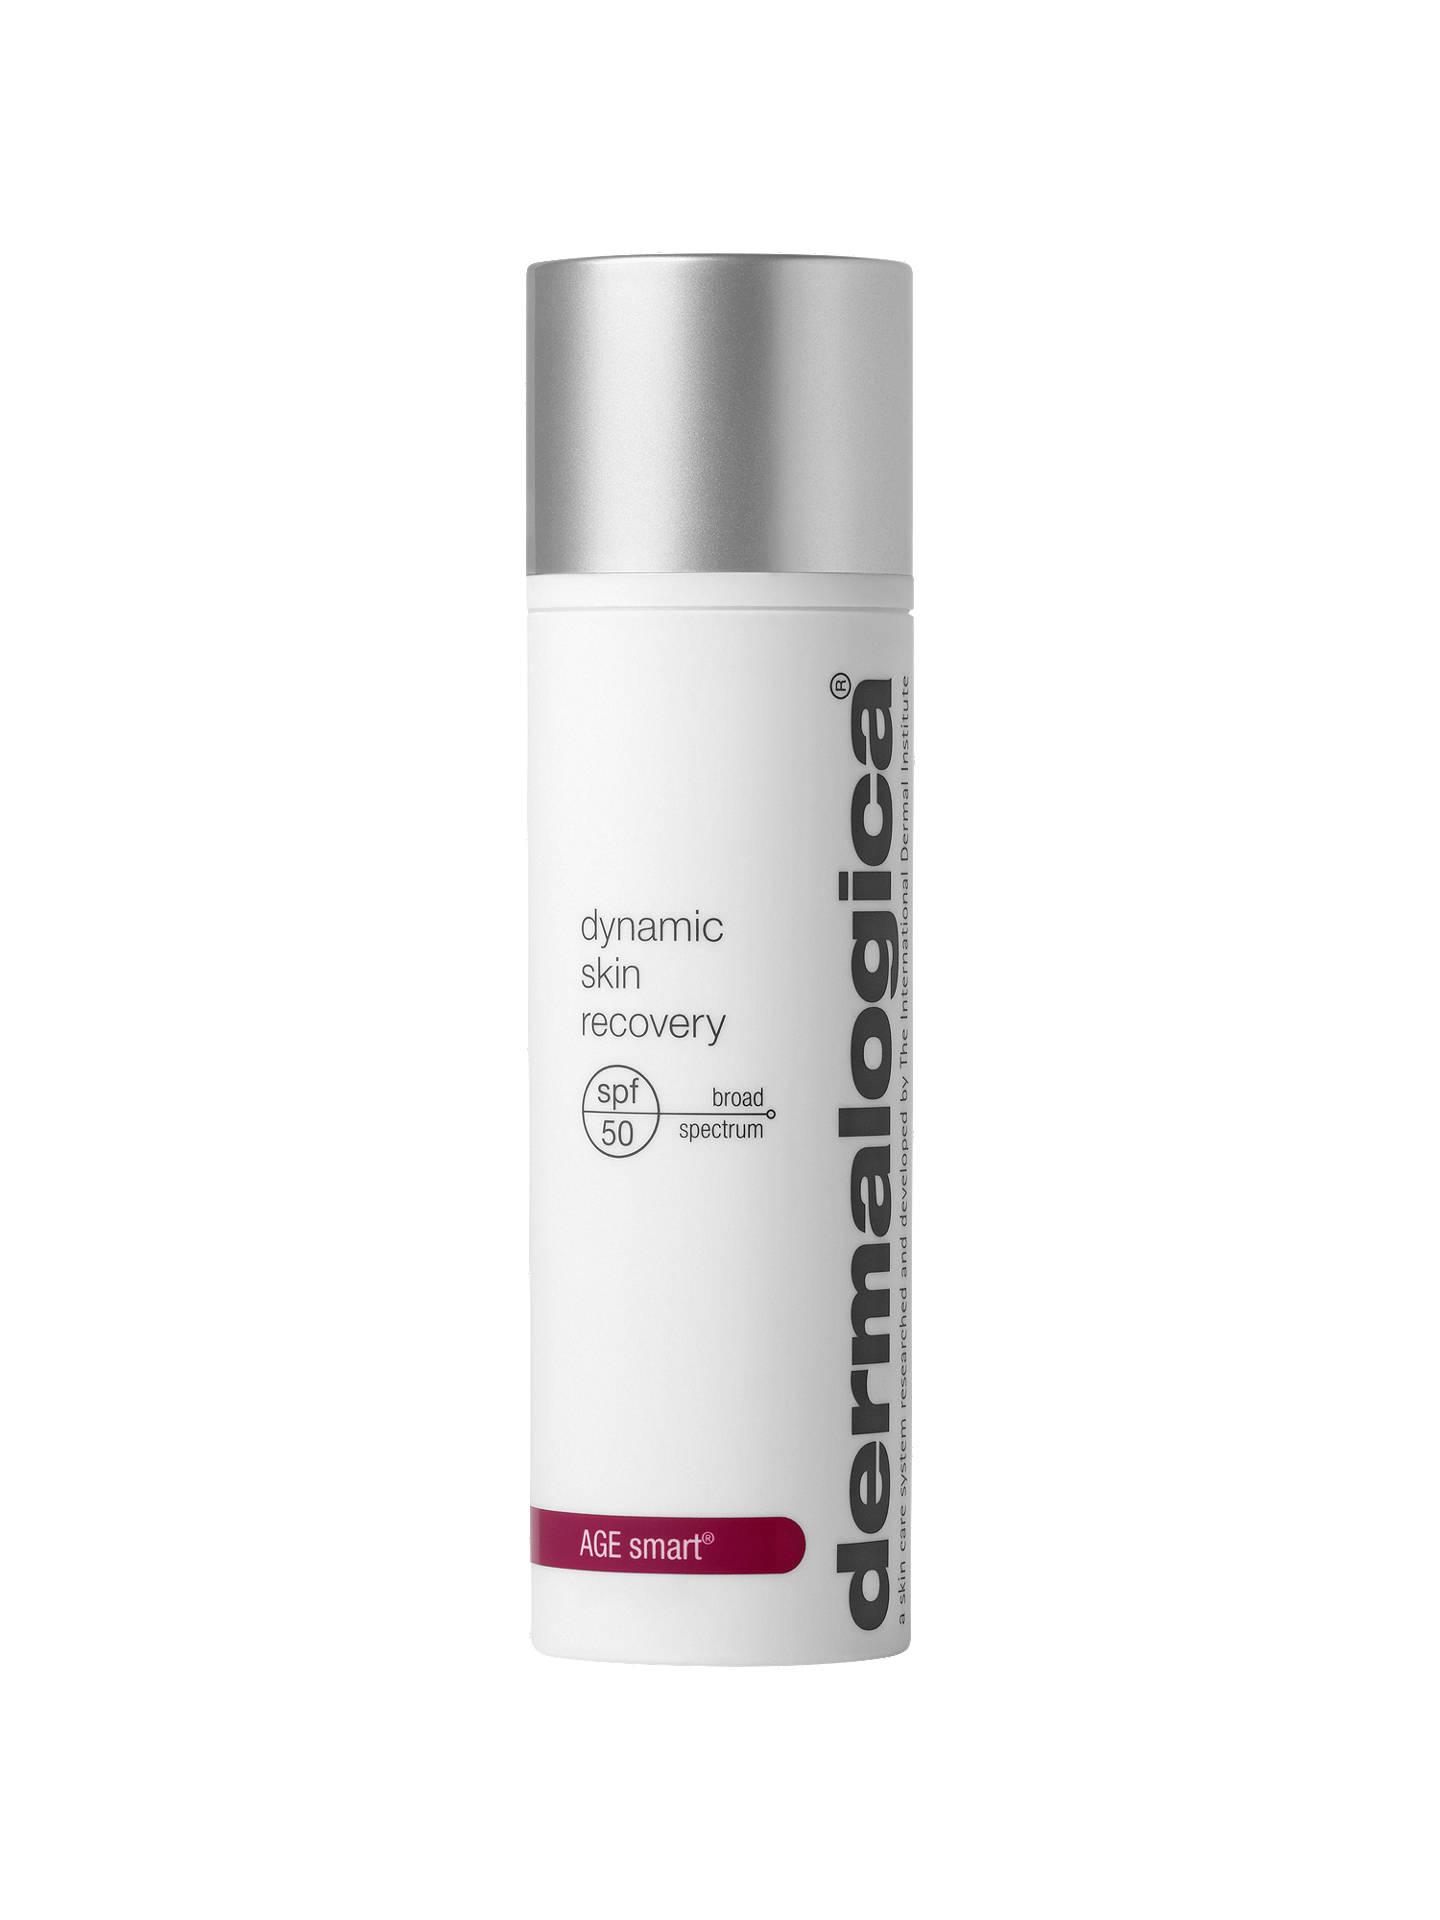 Dermalogica AGE Smart Dynamic Skin Recovery SPF 50, 50ml